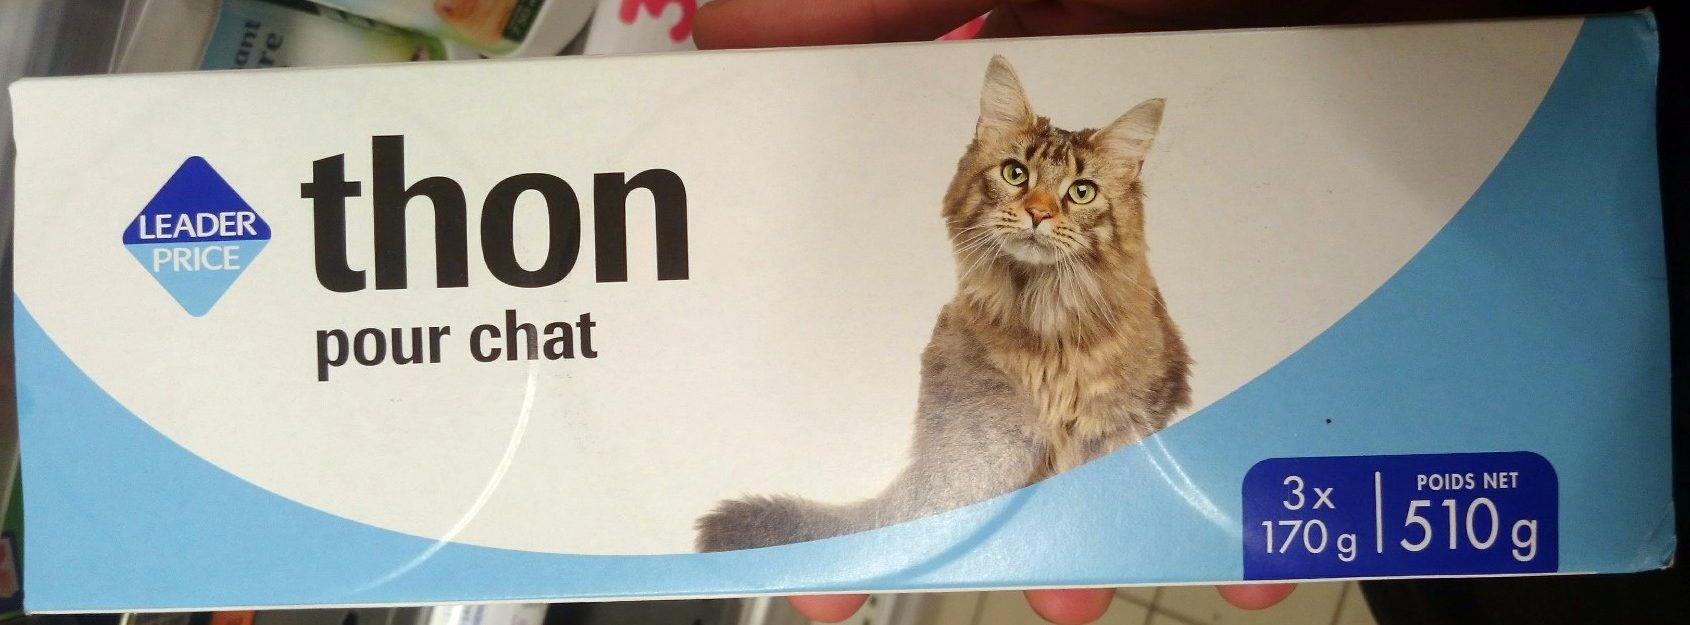 Thon pour chat - Product - fr